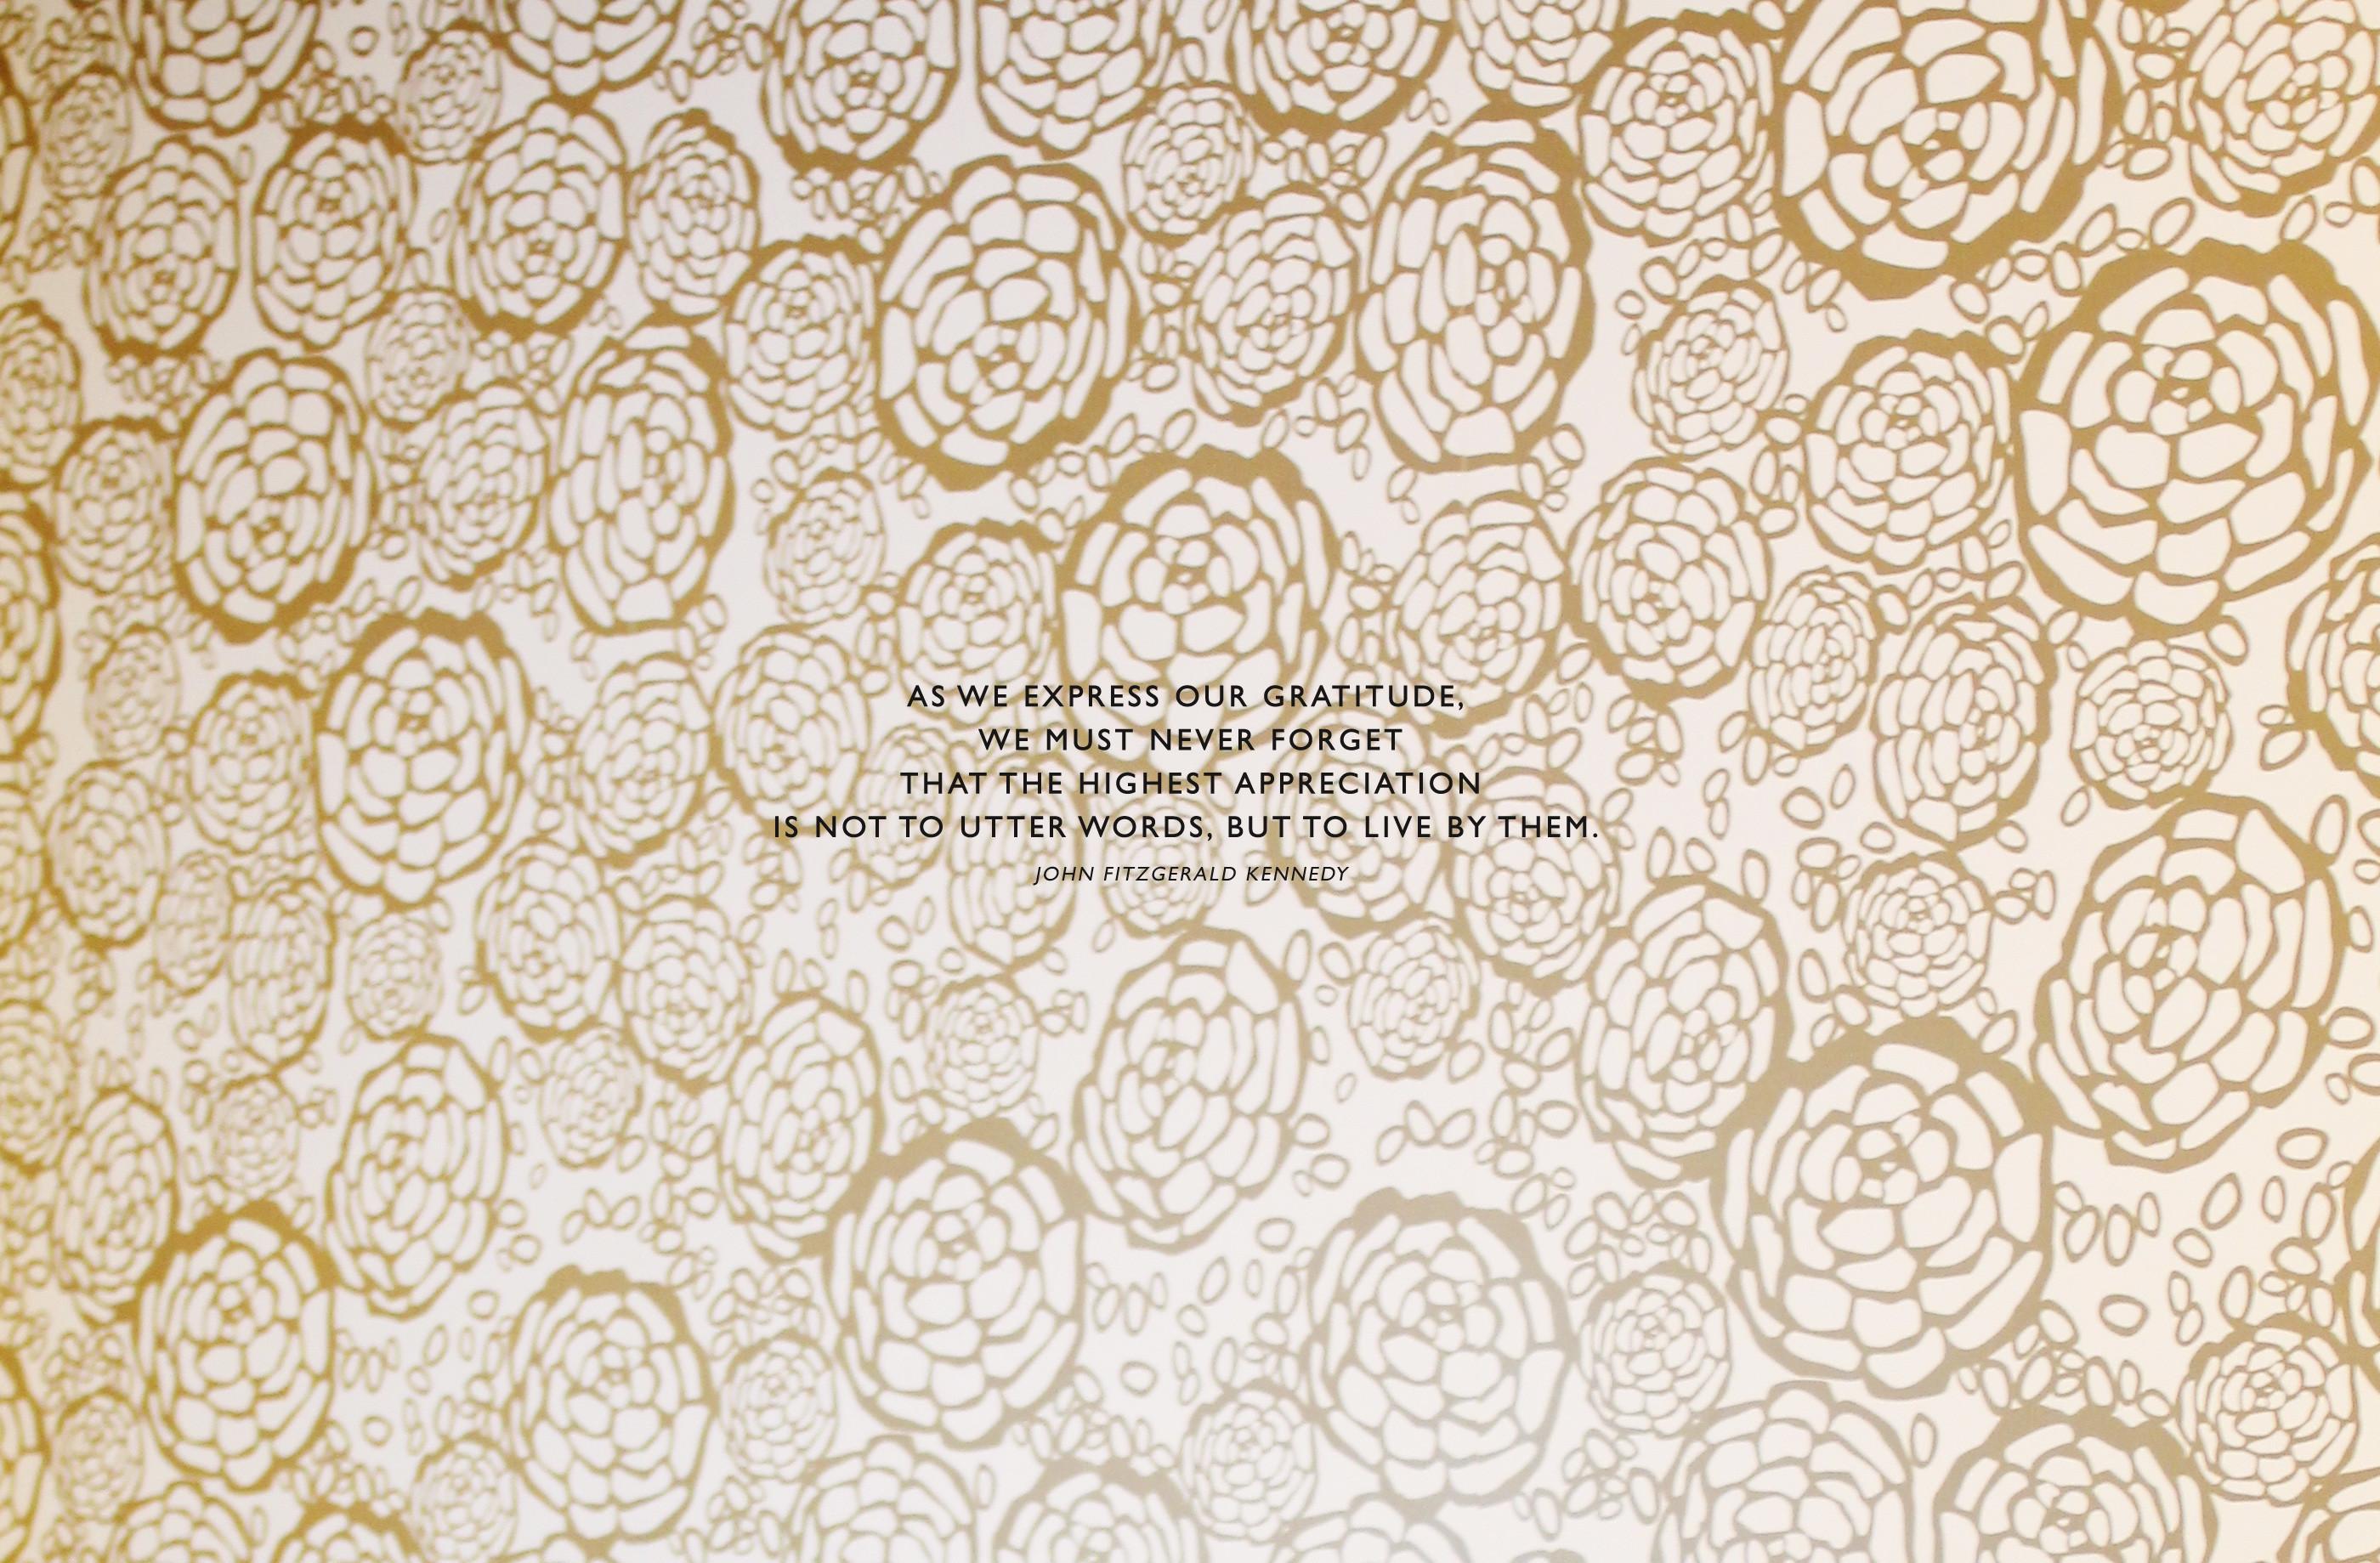 download full-size flower wallpaper here